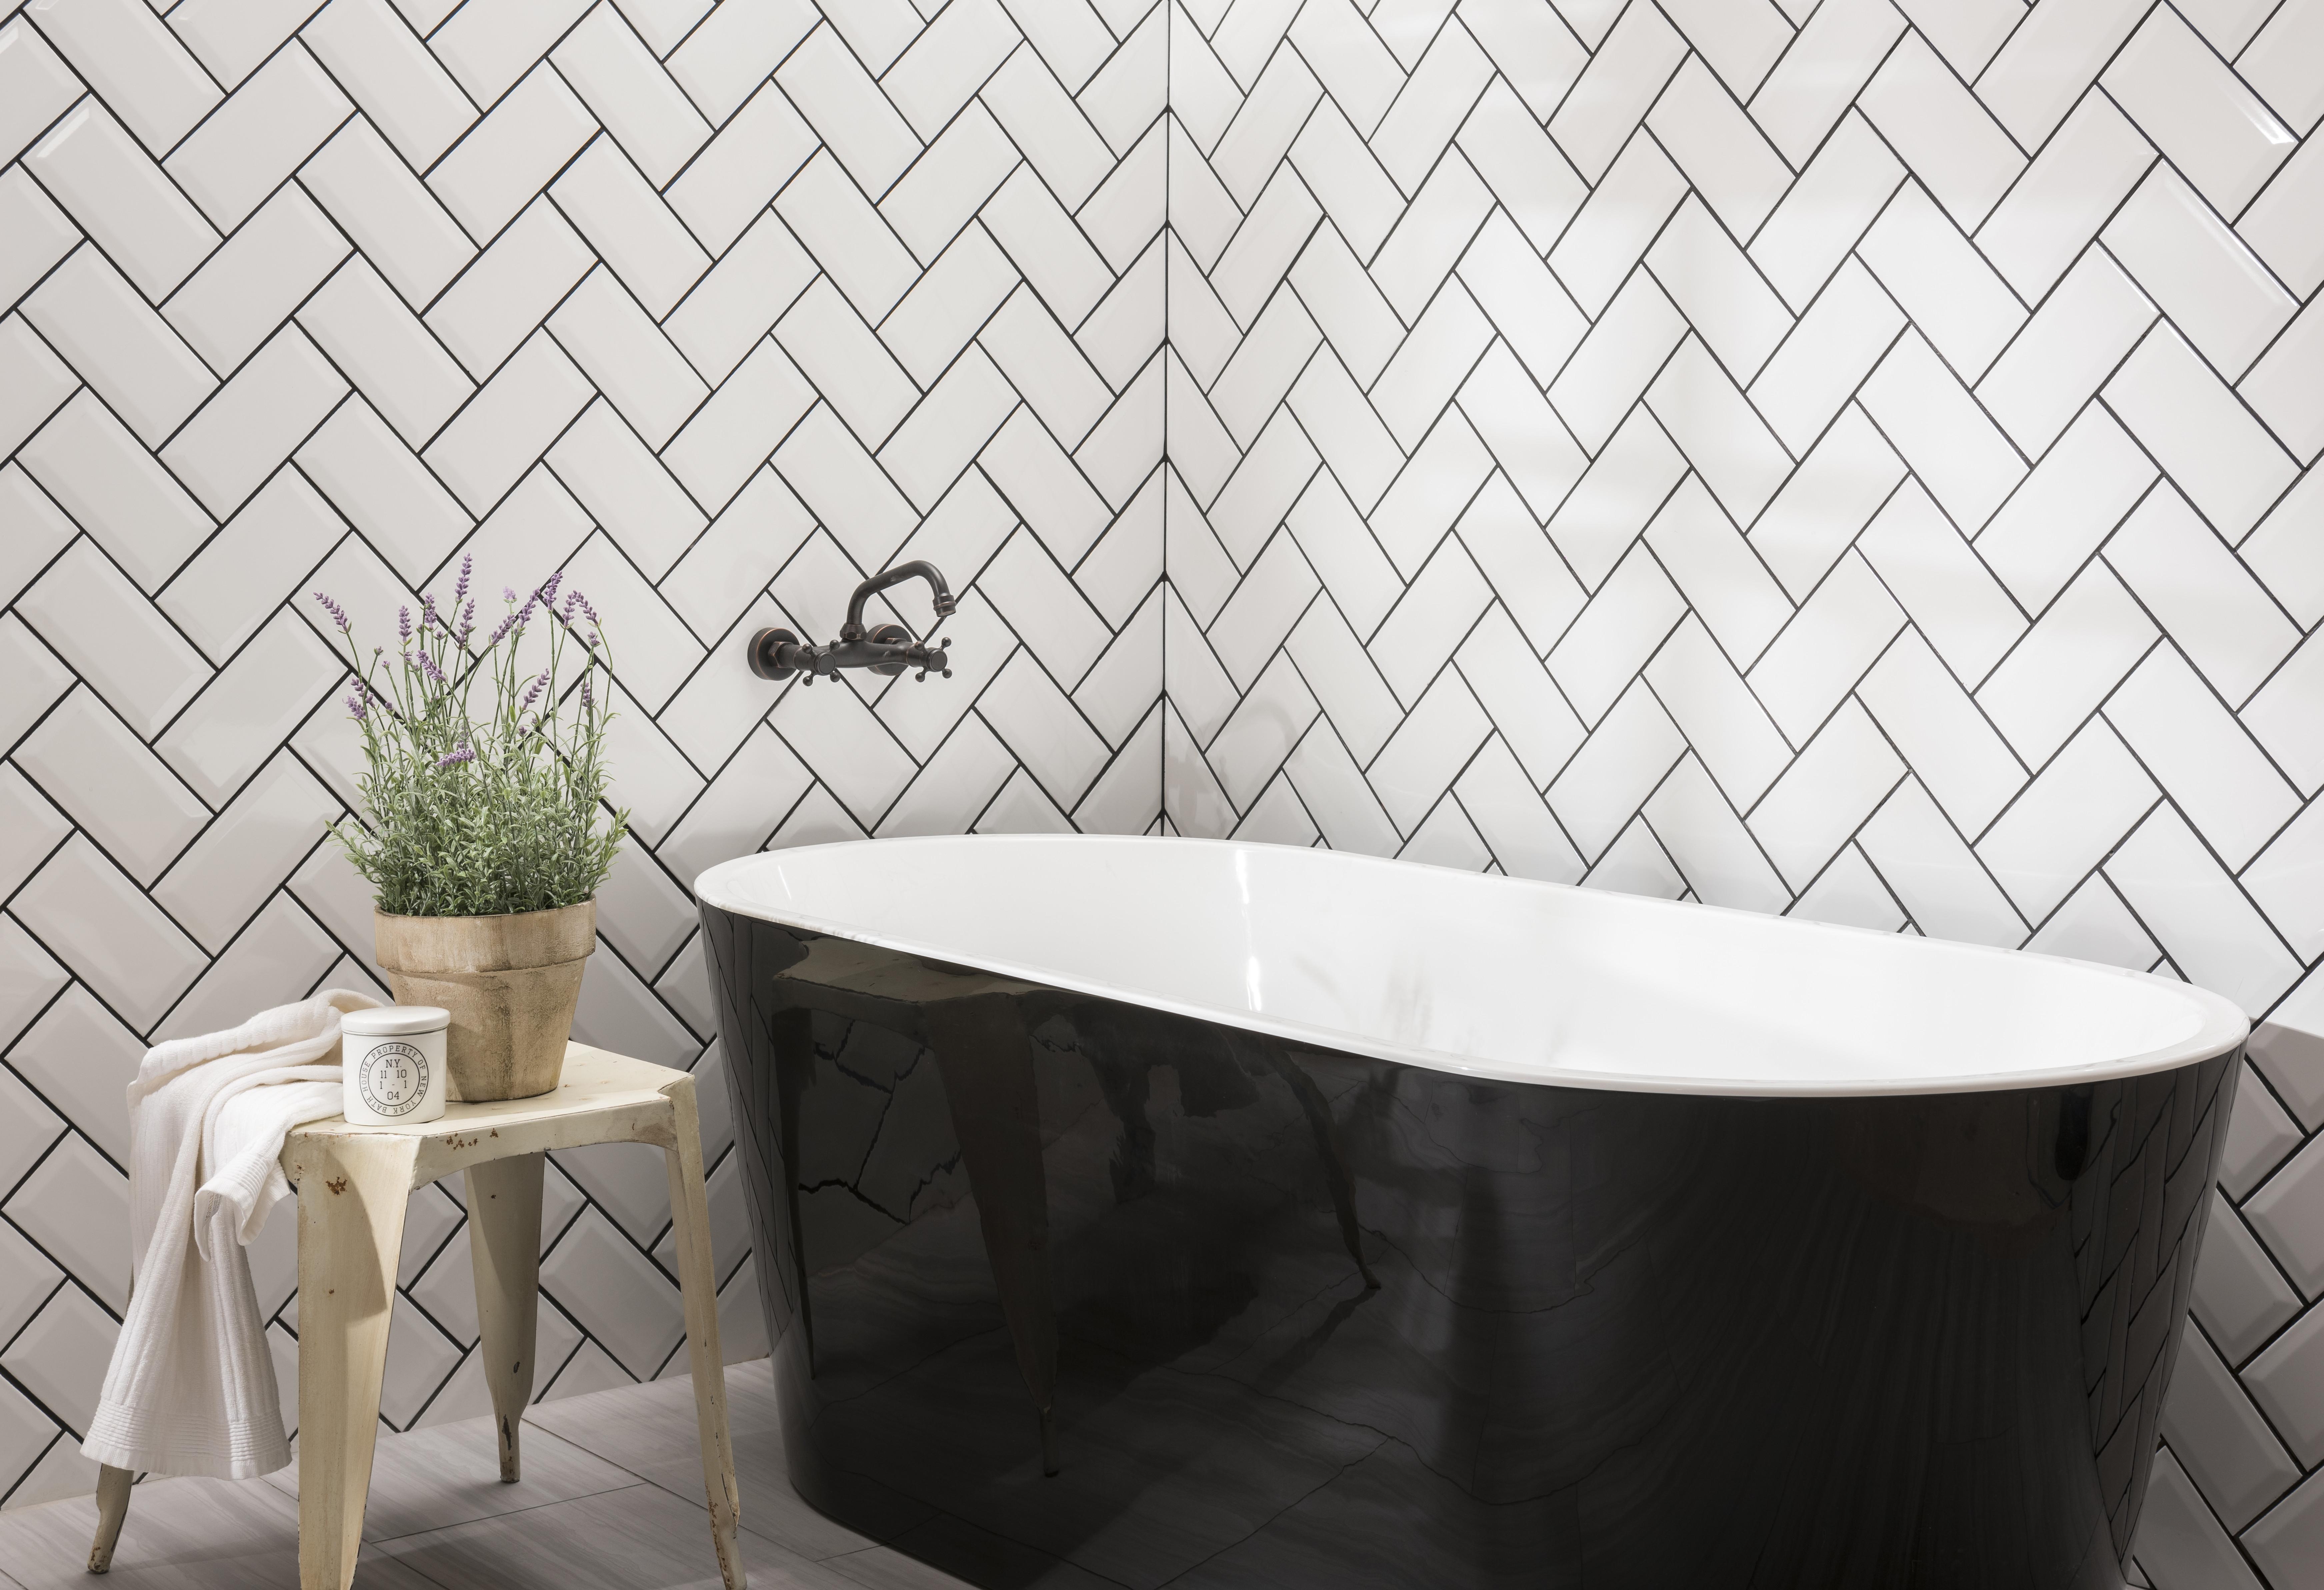 6 PCS  Anti Slip Bath Grip Stickers Non Slip Shower Strips Pad Flooring SafeyL/_D